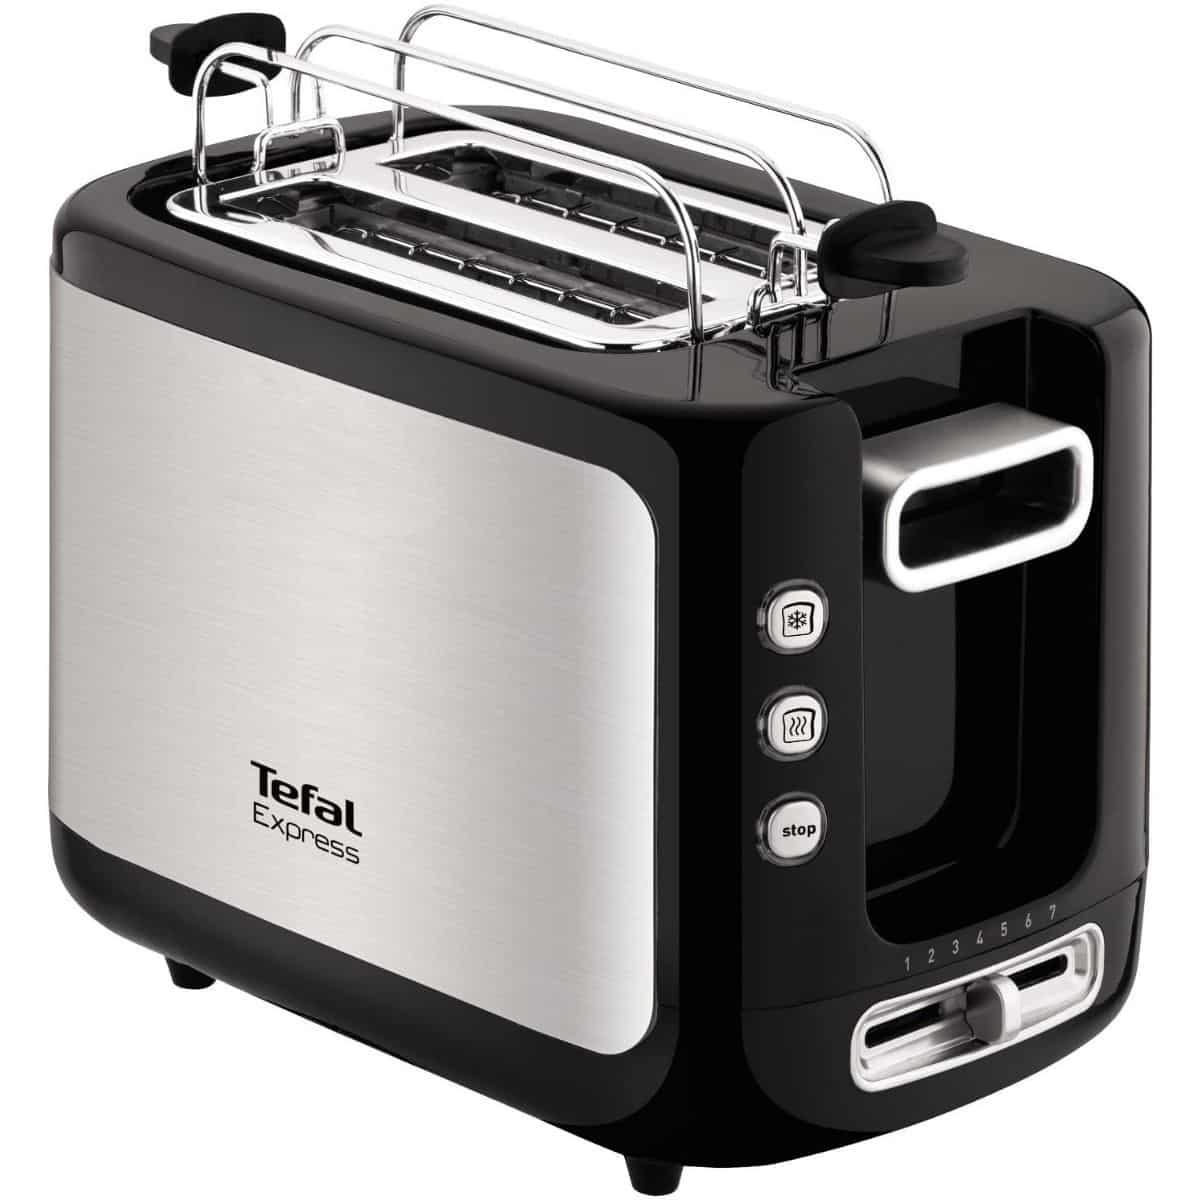 Tefal TT3650 Toaster